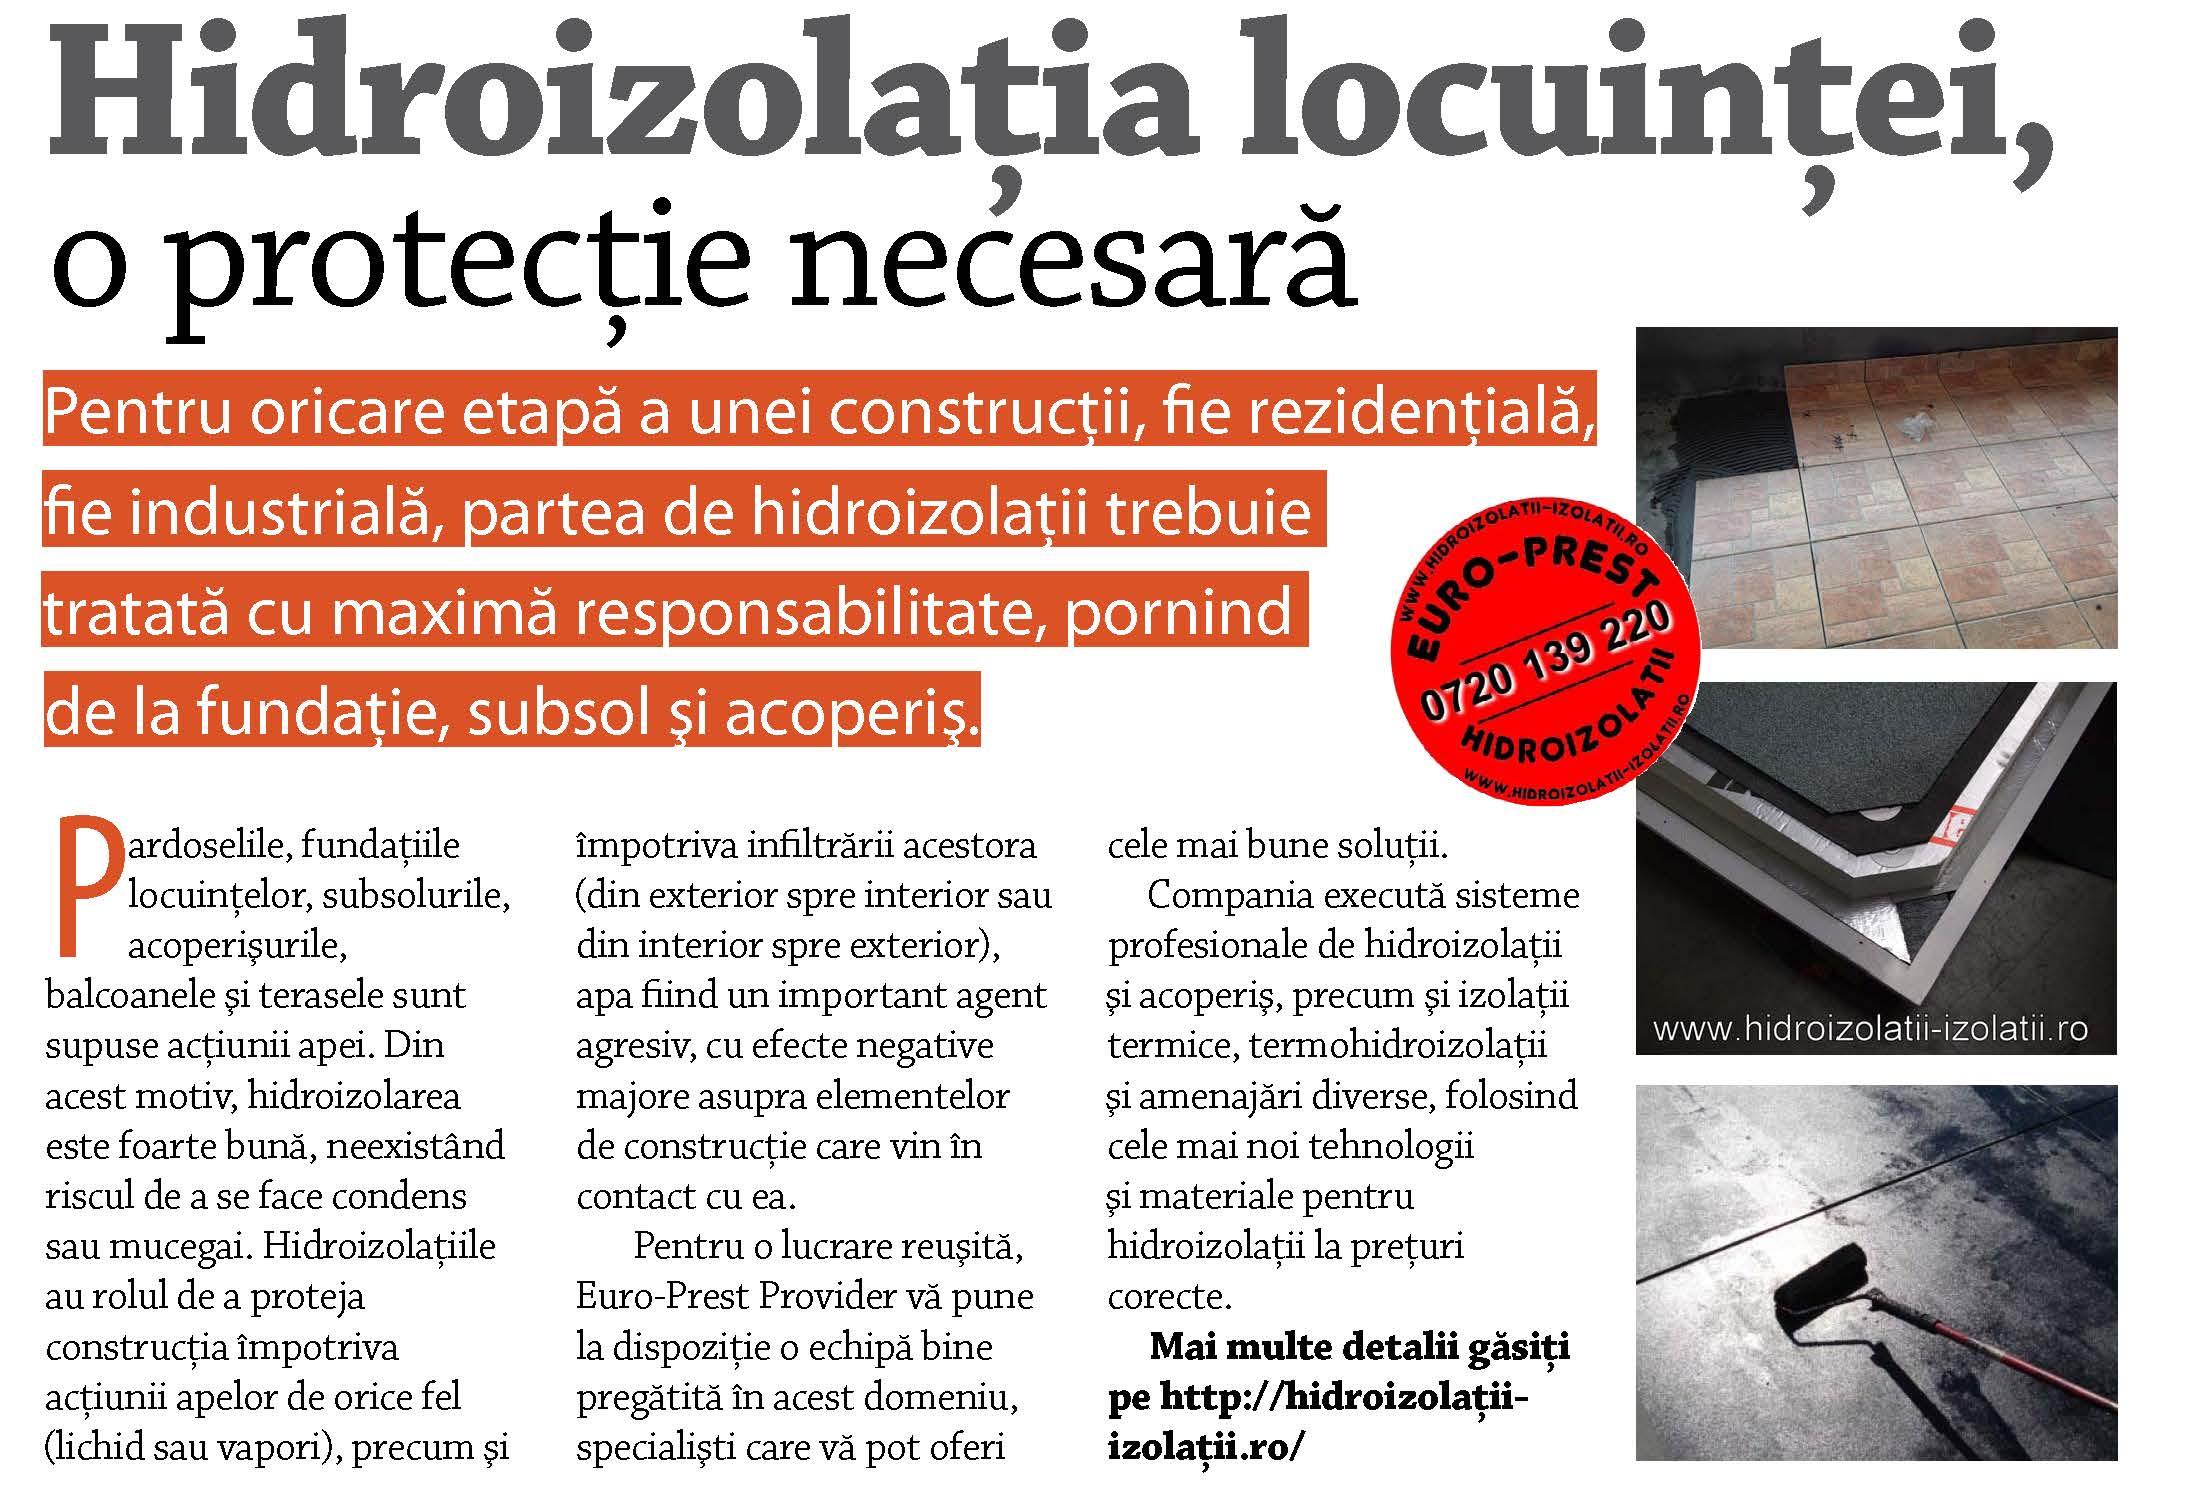 Hidroizolatia locuintei, o protectie necesara - Hidroizolatia locuintei, o protectie necesara